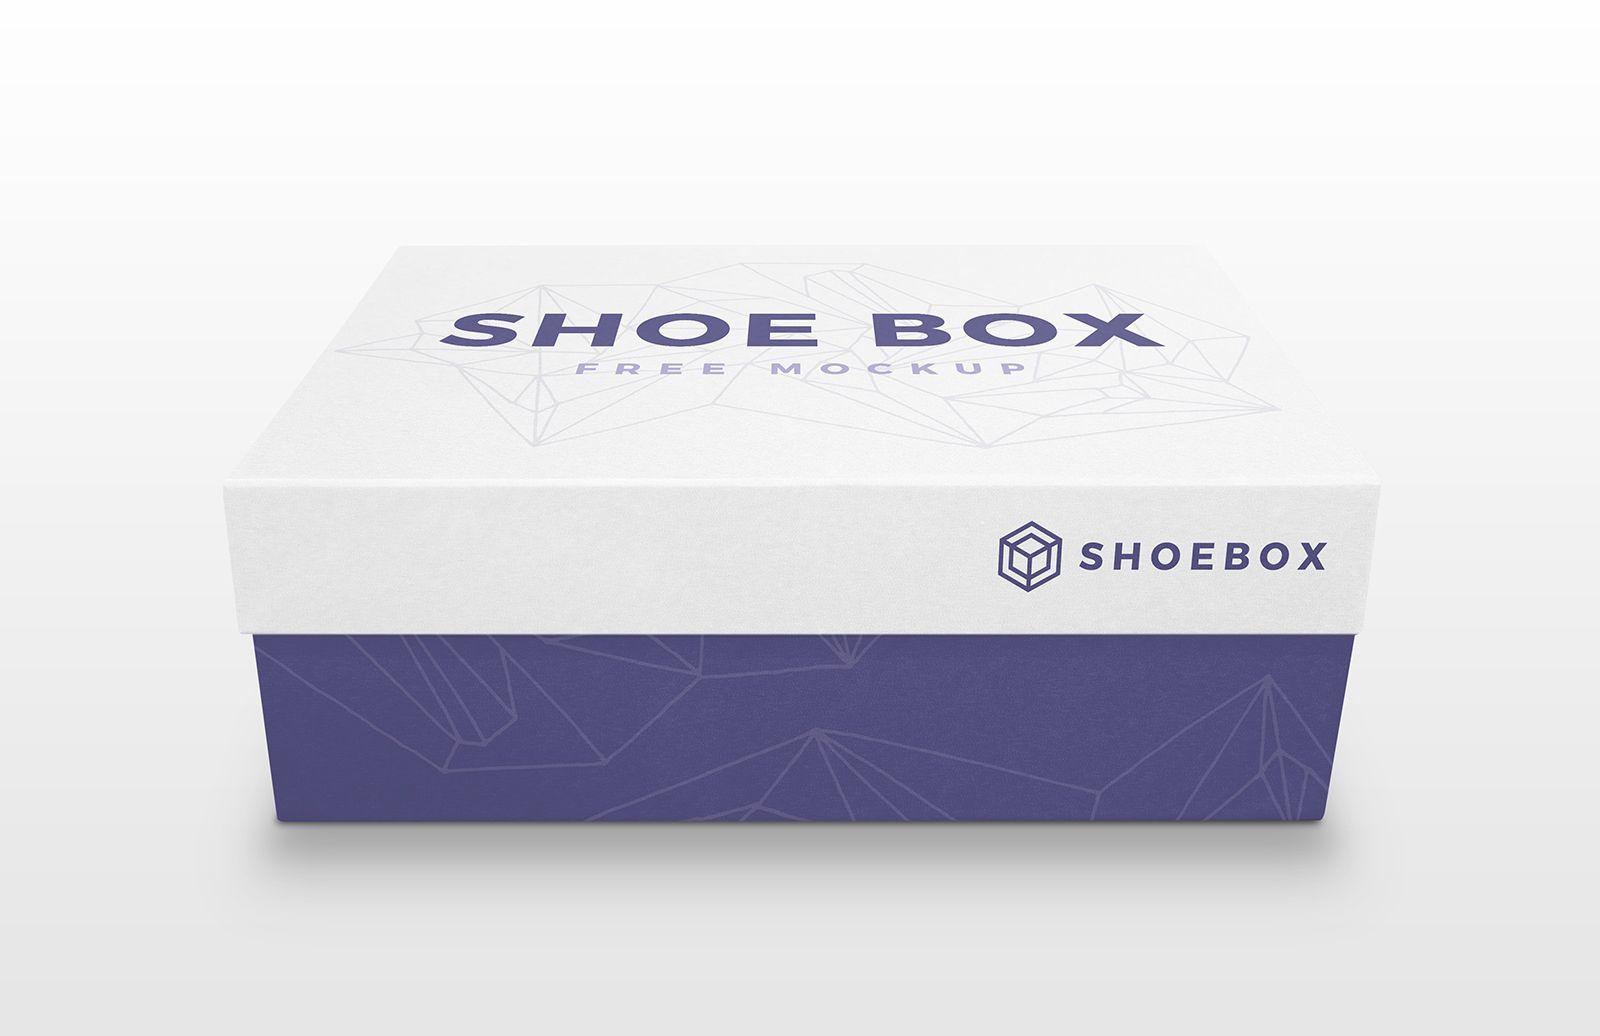 Download Free Shoe Box Mockup Psd Shoe Box Minimalist Shoes Box Mockup